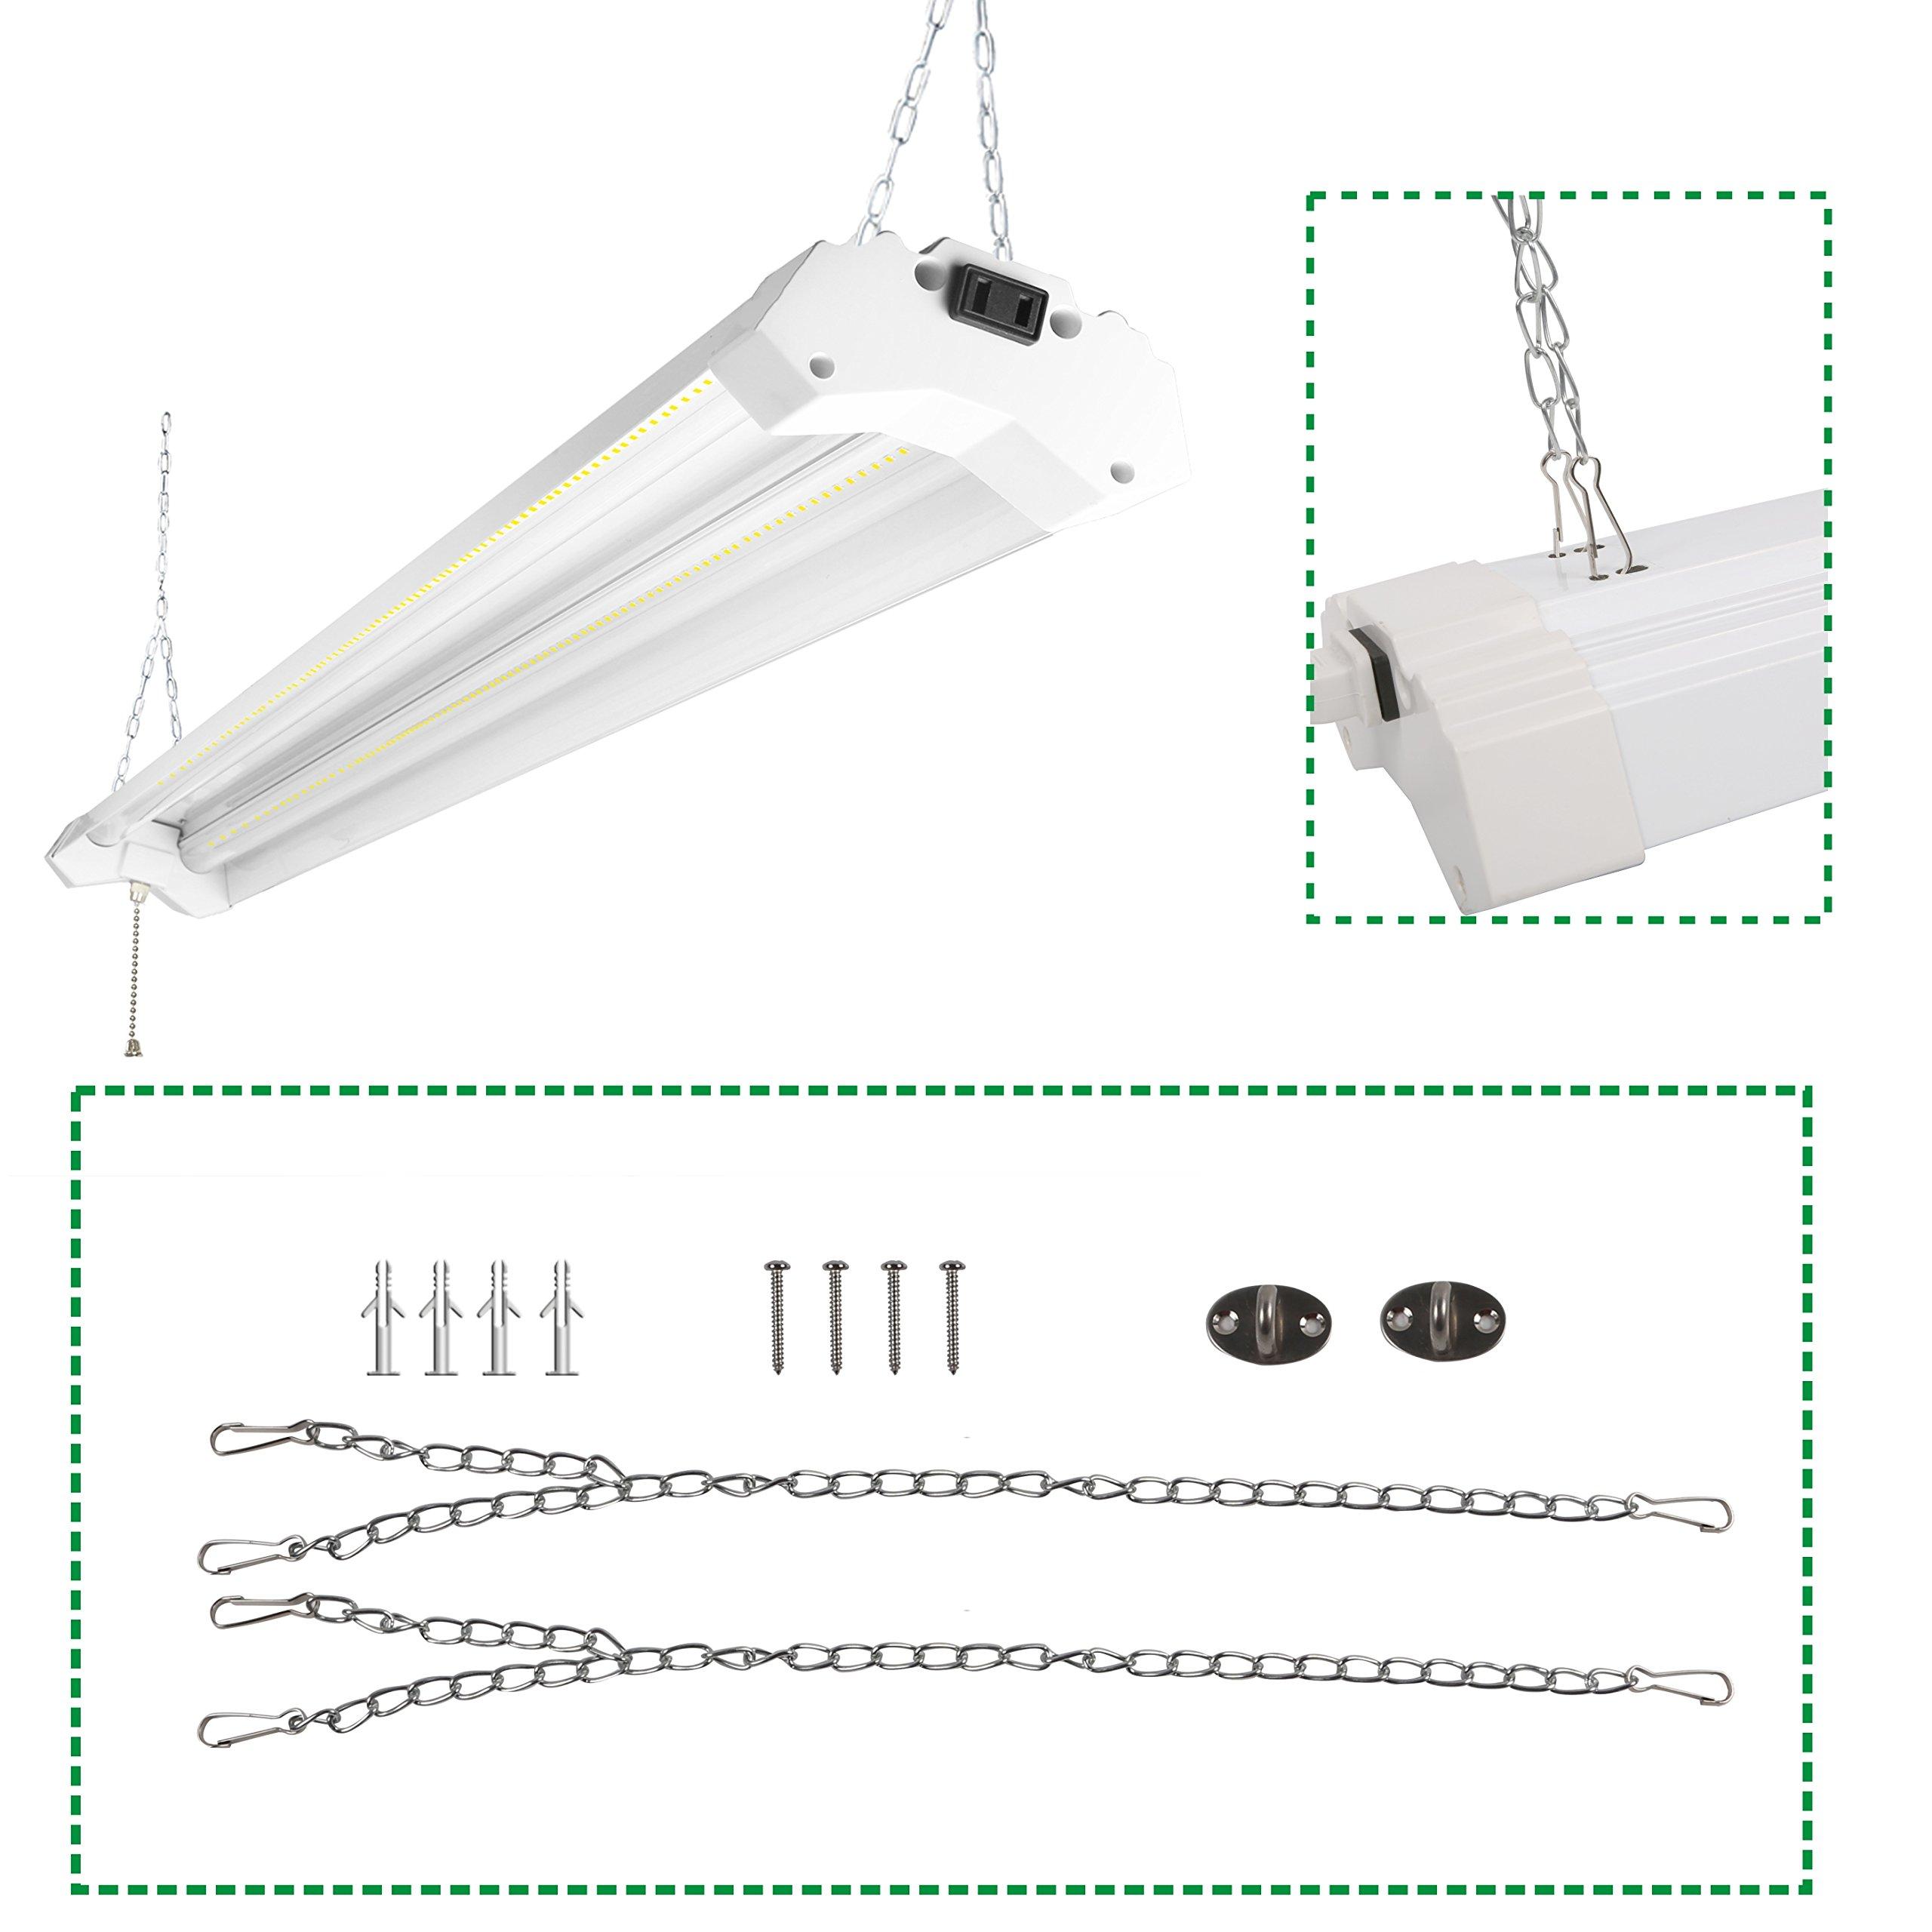 5000 Lumen 4000k Led Garage Shop Light Fixture Hanging